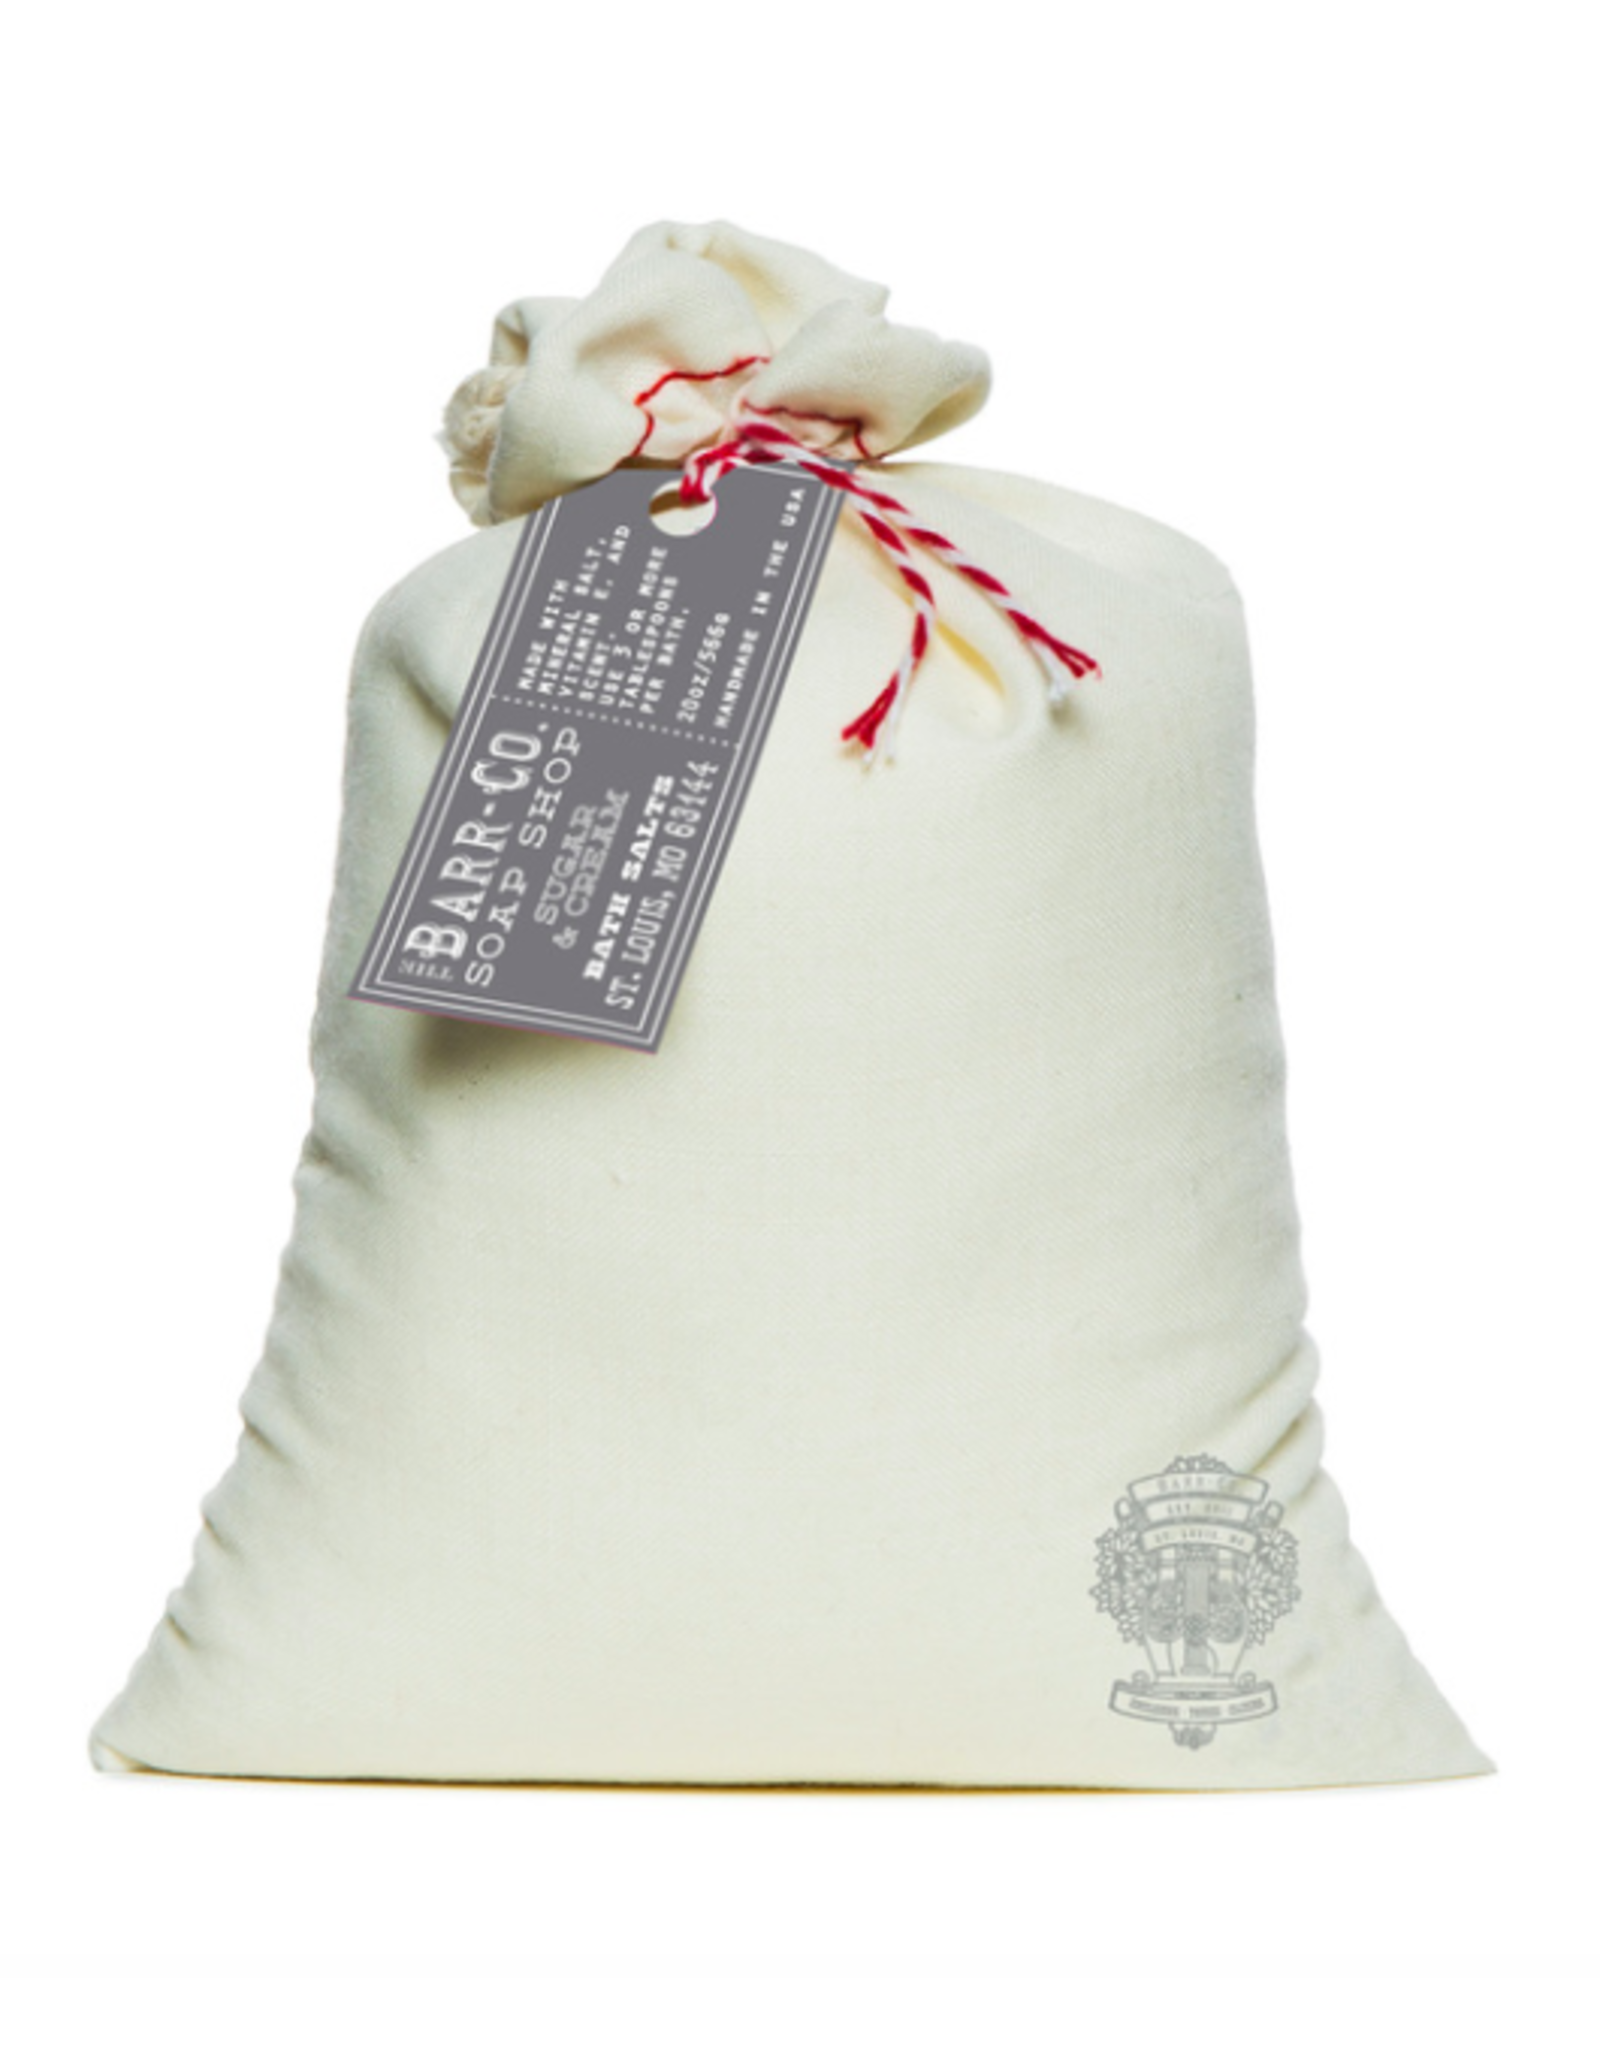 Barr-Co Sugar & Cream Bath Soak Bag